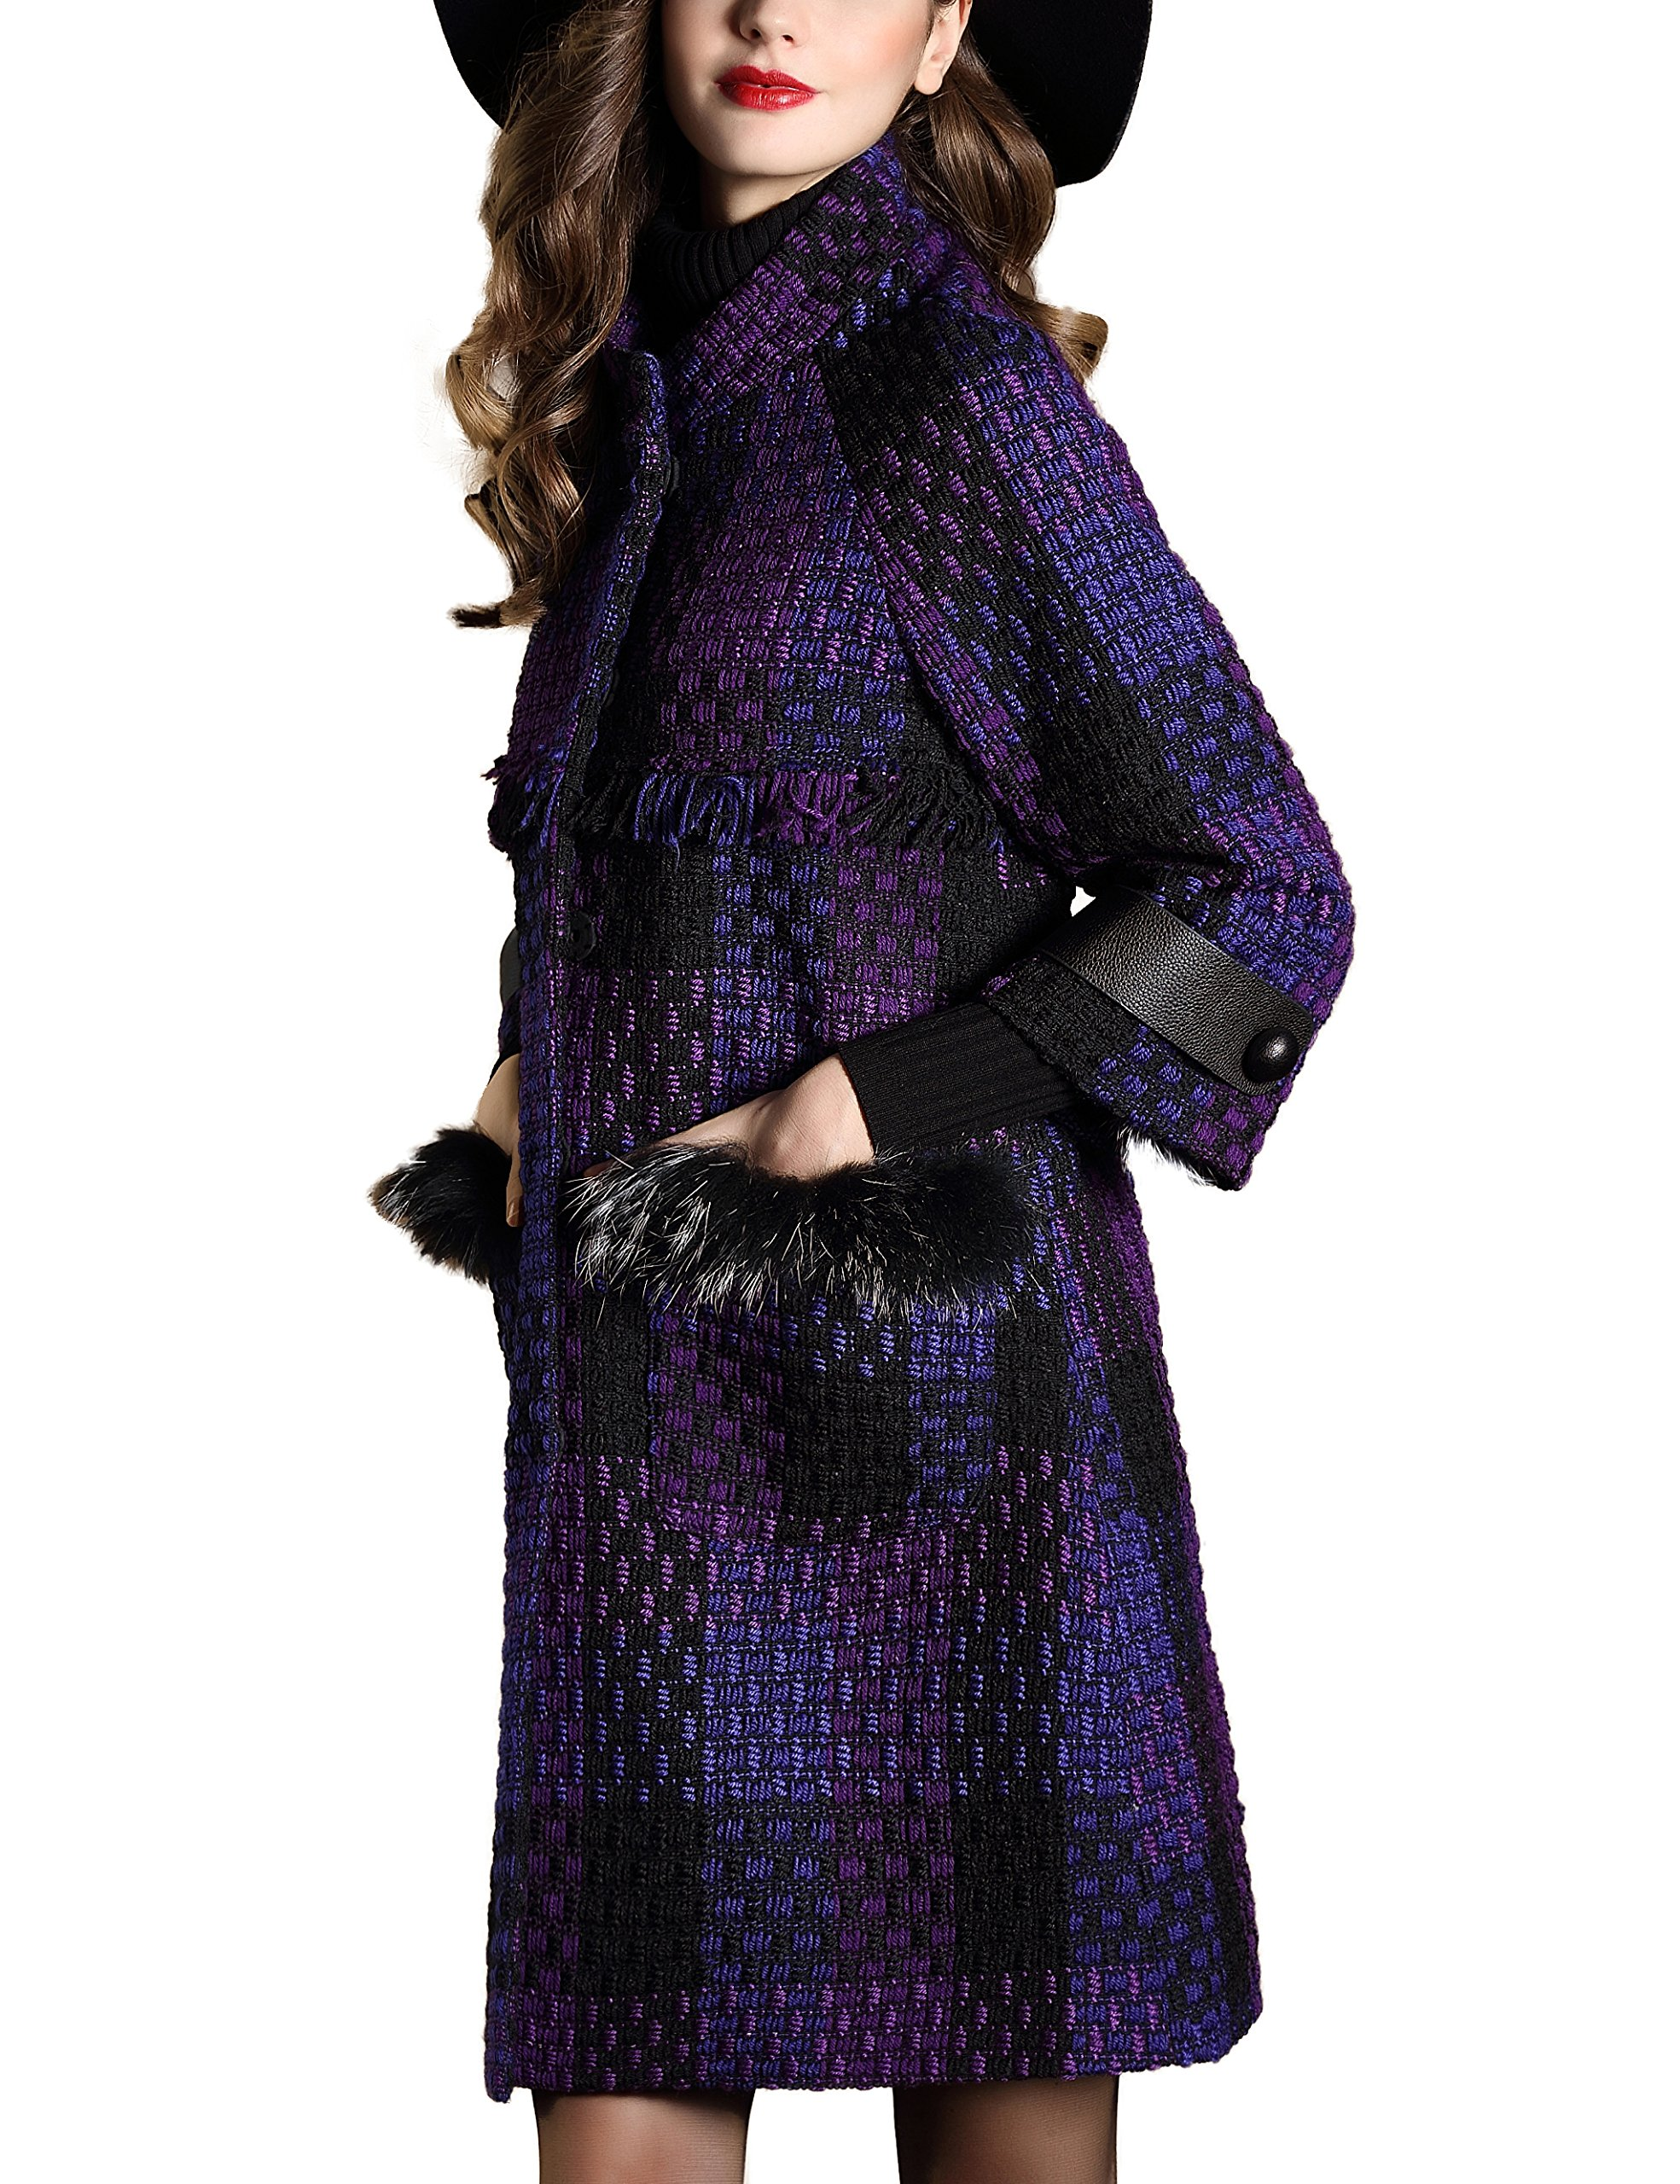 DanMunier Women's Winter Classic Double-Breasted Coat #4358 (M, Purple) by DanMunier (Image #3)